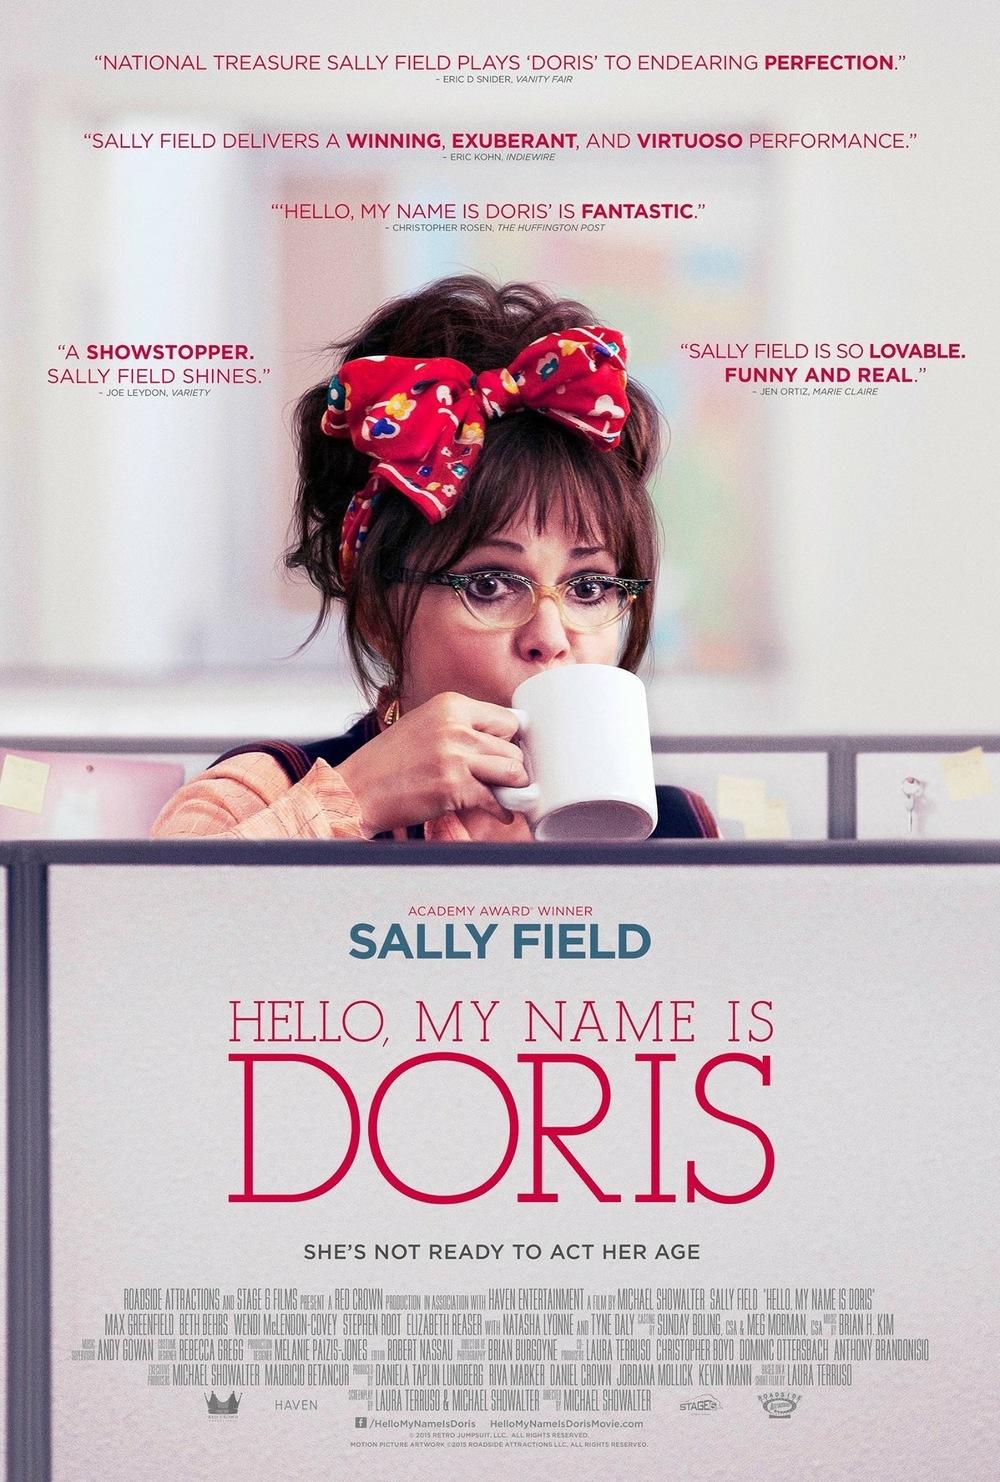 Doris Poster.jpg